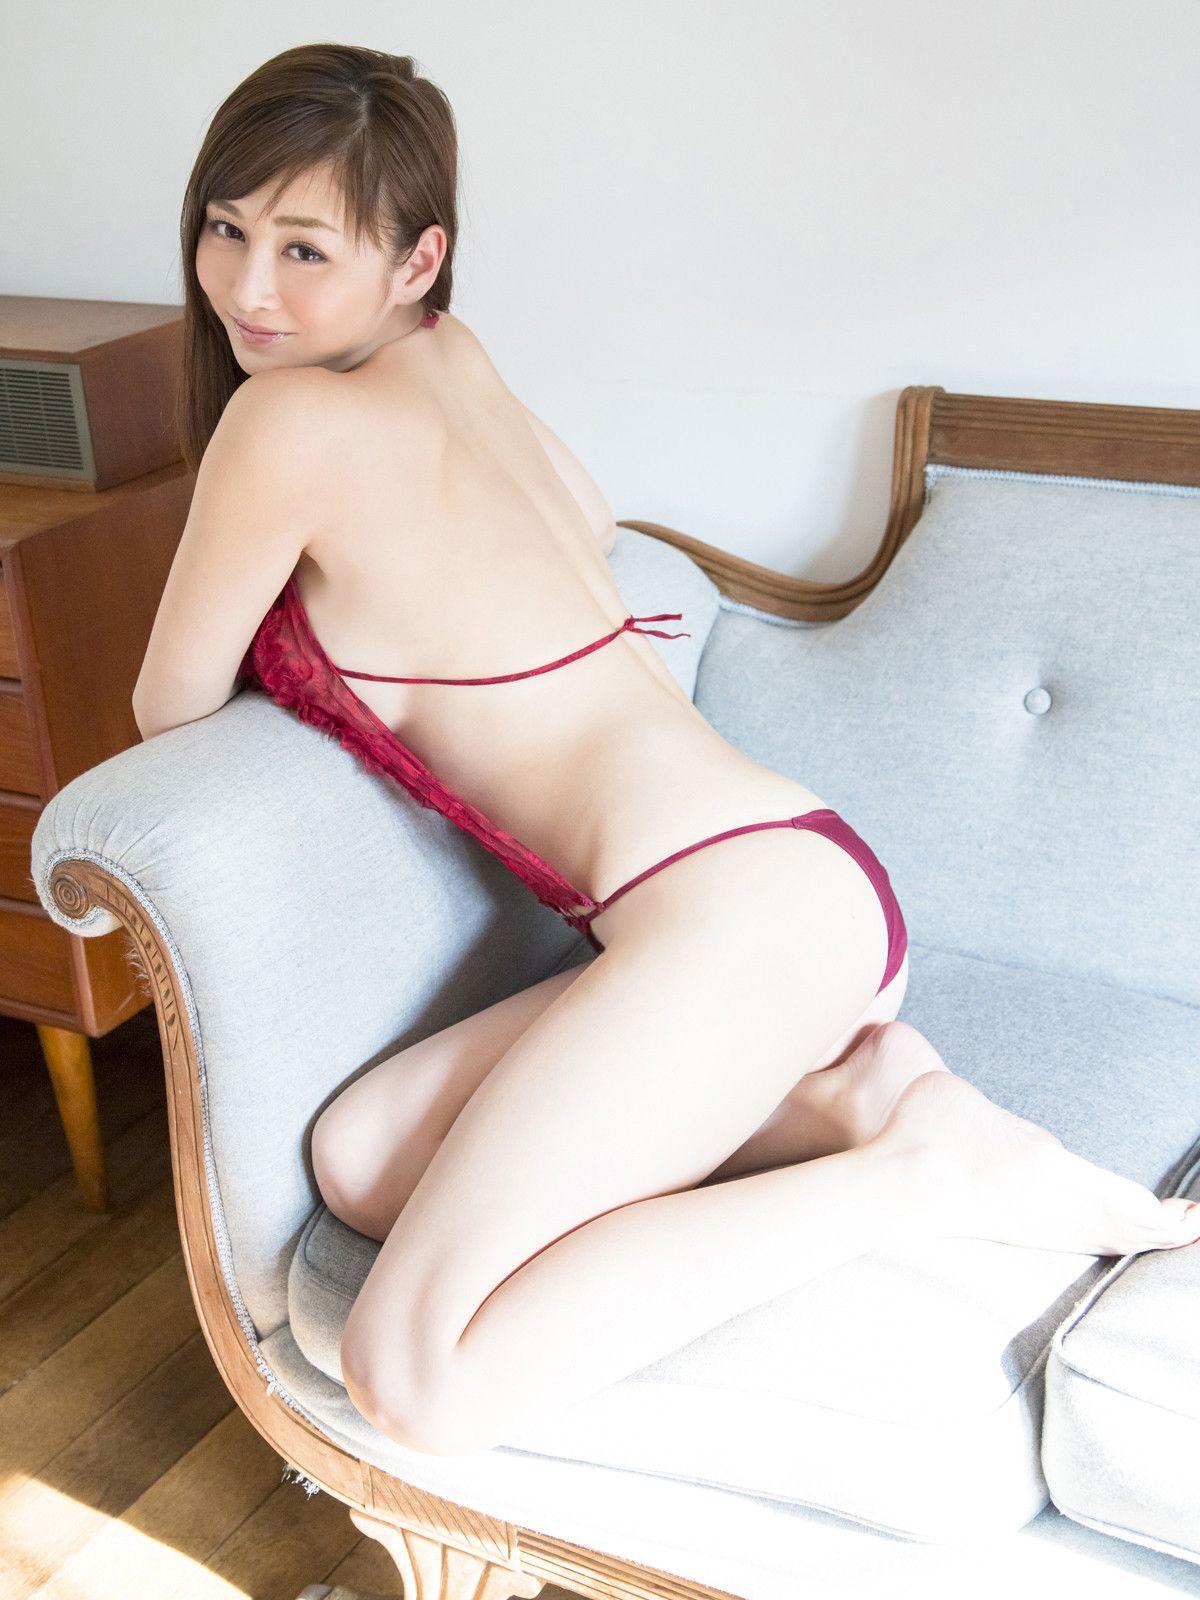 Sideboobs Anri Sugihara nudes (13 photos), Topless, Leaked, Twitter, see through 2018